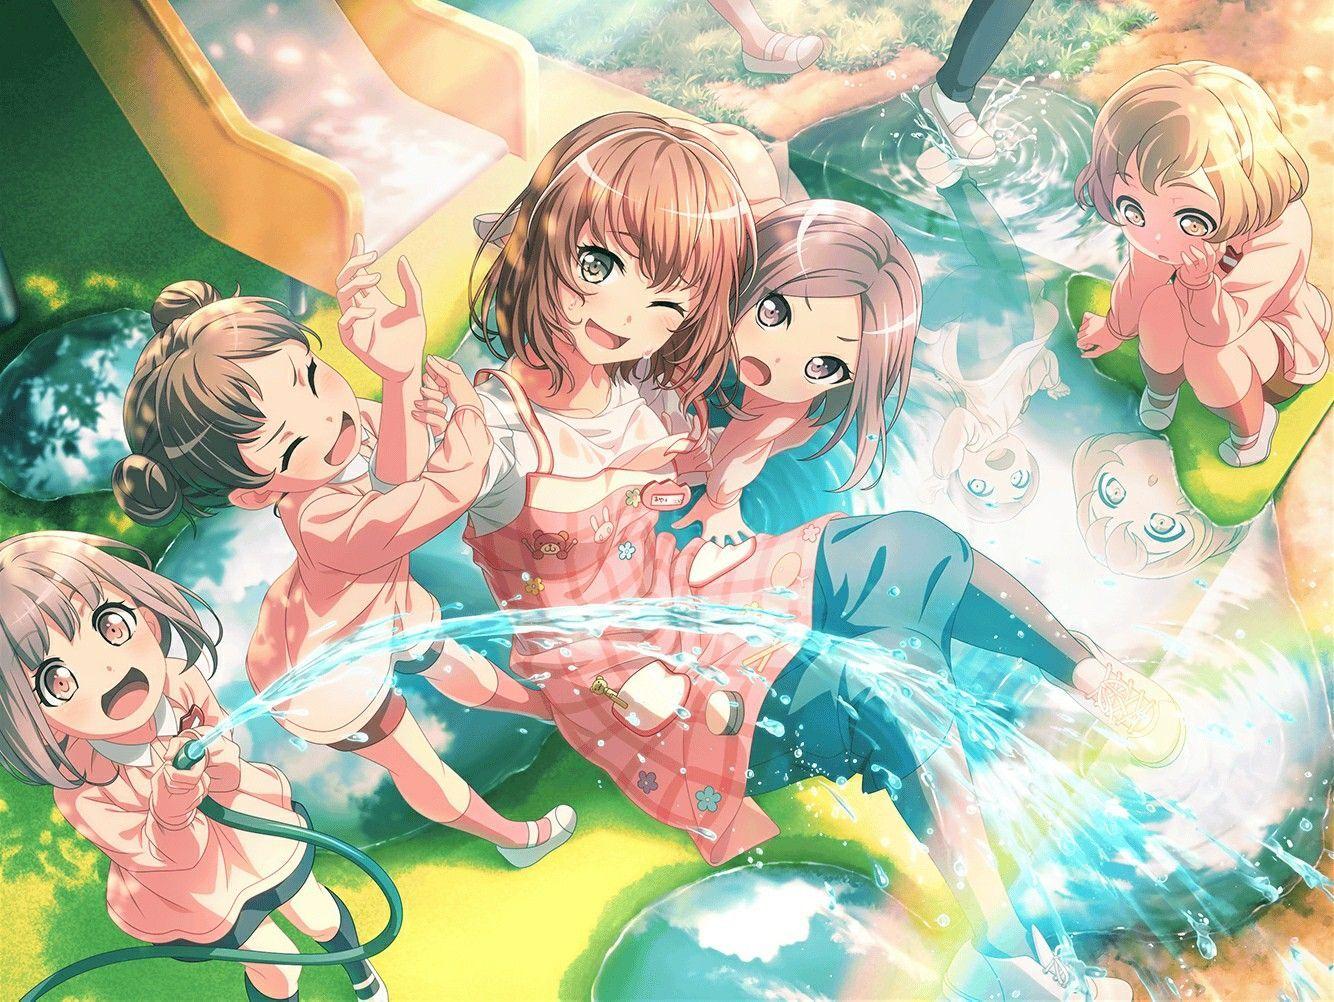 Pin on รูปถ่าย in 2020 Anime best friends, Anime art